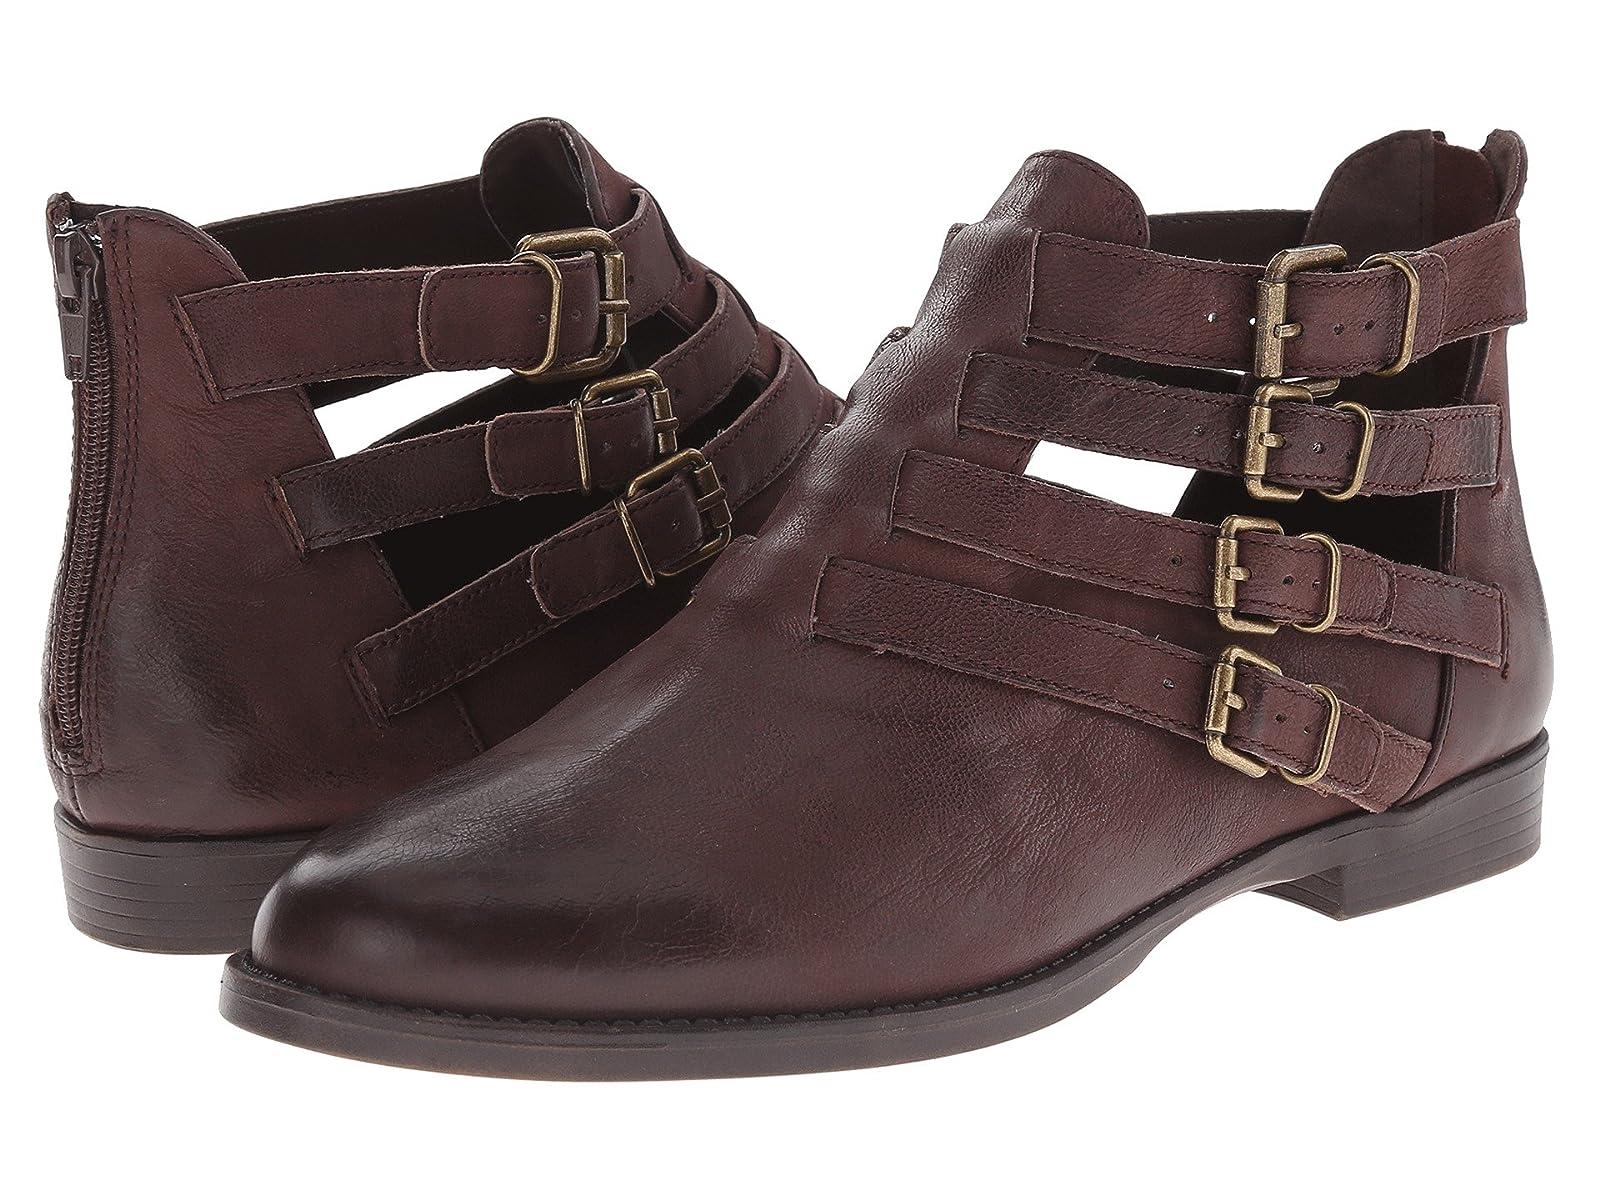 Bella-Vita RonanCheap and distinctive eye-catching shoes